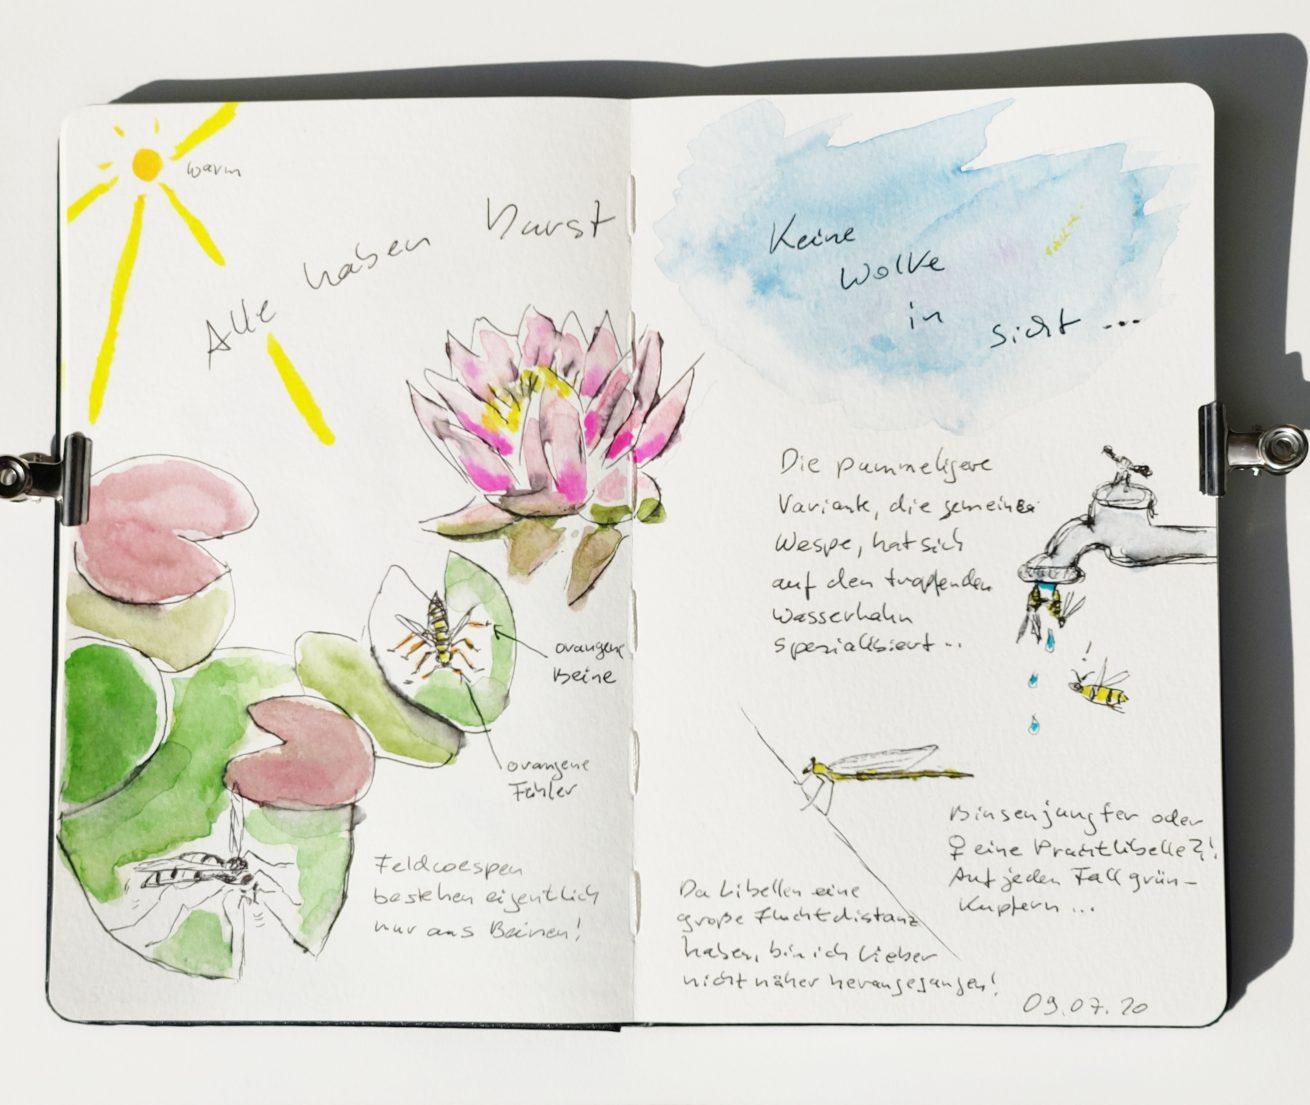 Nature_Journal_Seerose_Feldwespen_Binsenjungfer